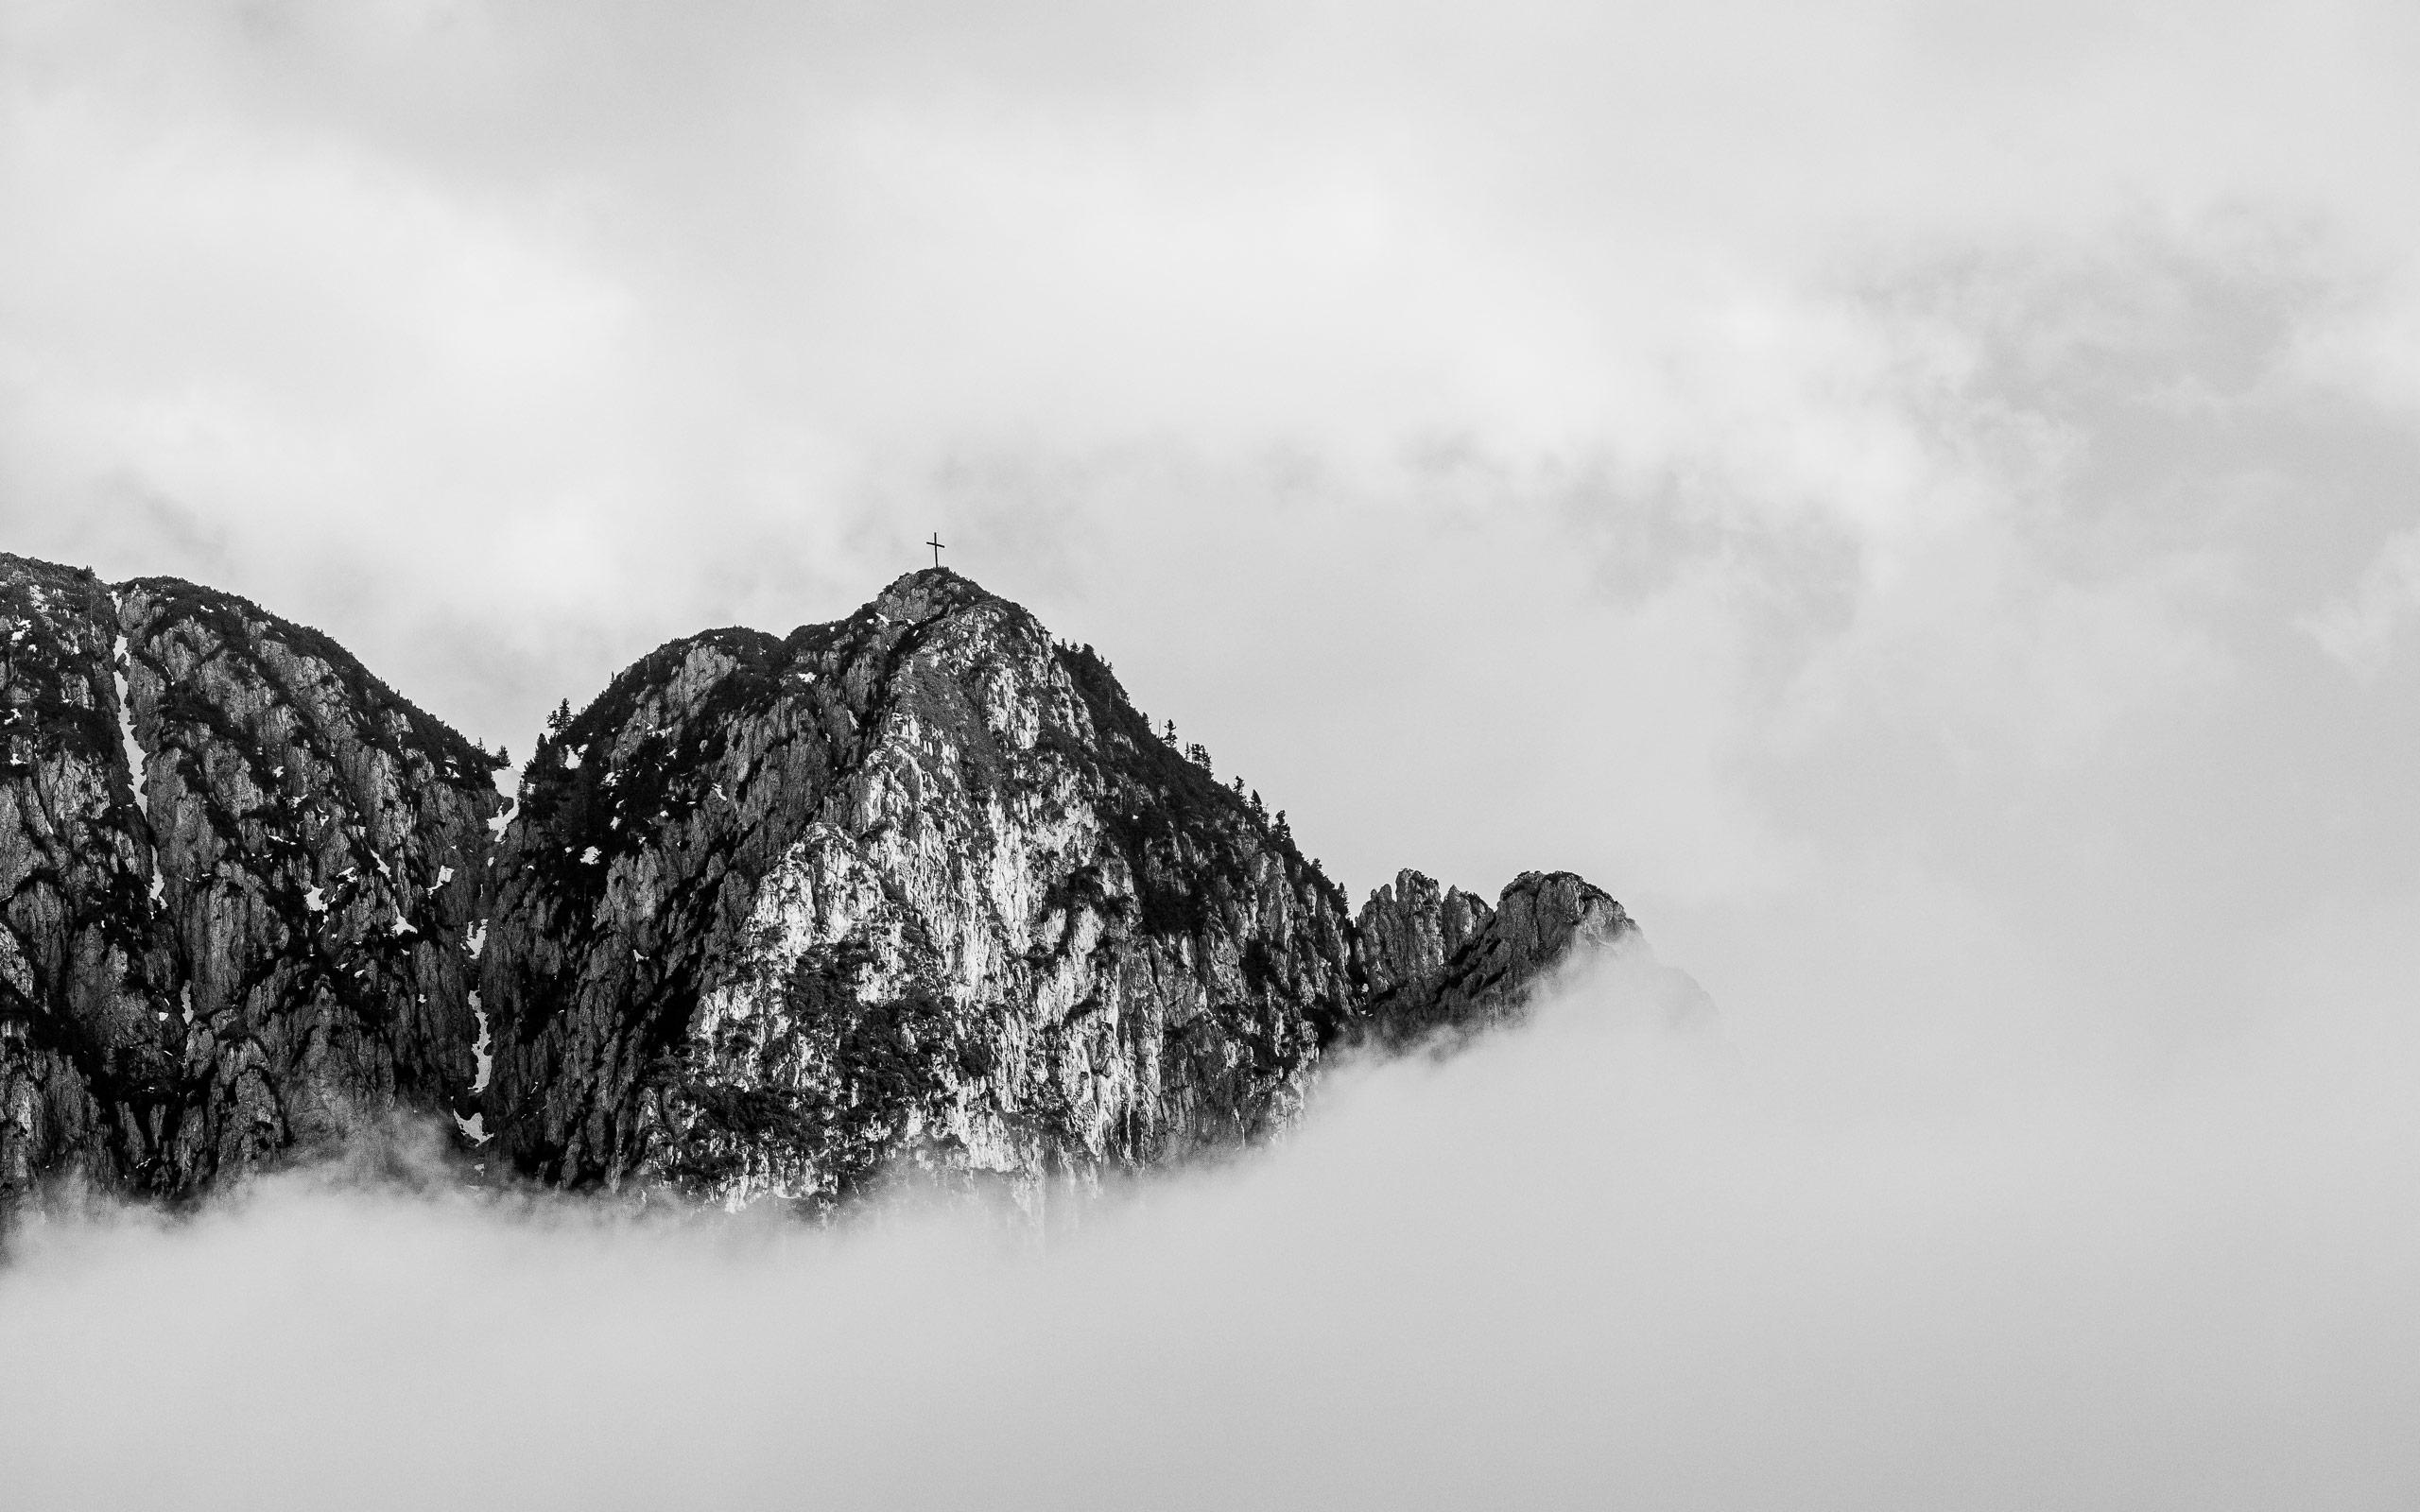 Tom_Schueler_Fotografie_Landschaft_Alpen_Dolomiten_9